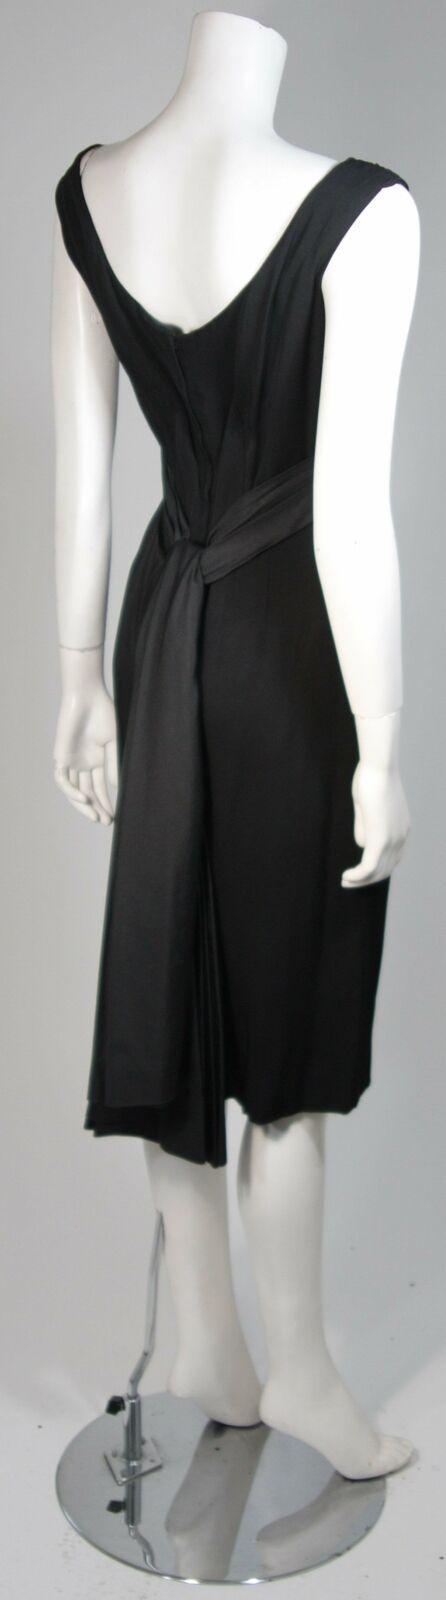 CEIL CHAPMAN 1950s Black Draped Cocktail Dress Si… - image 9